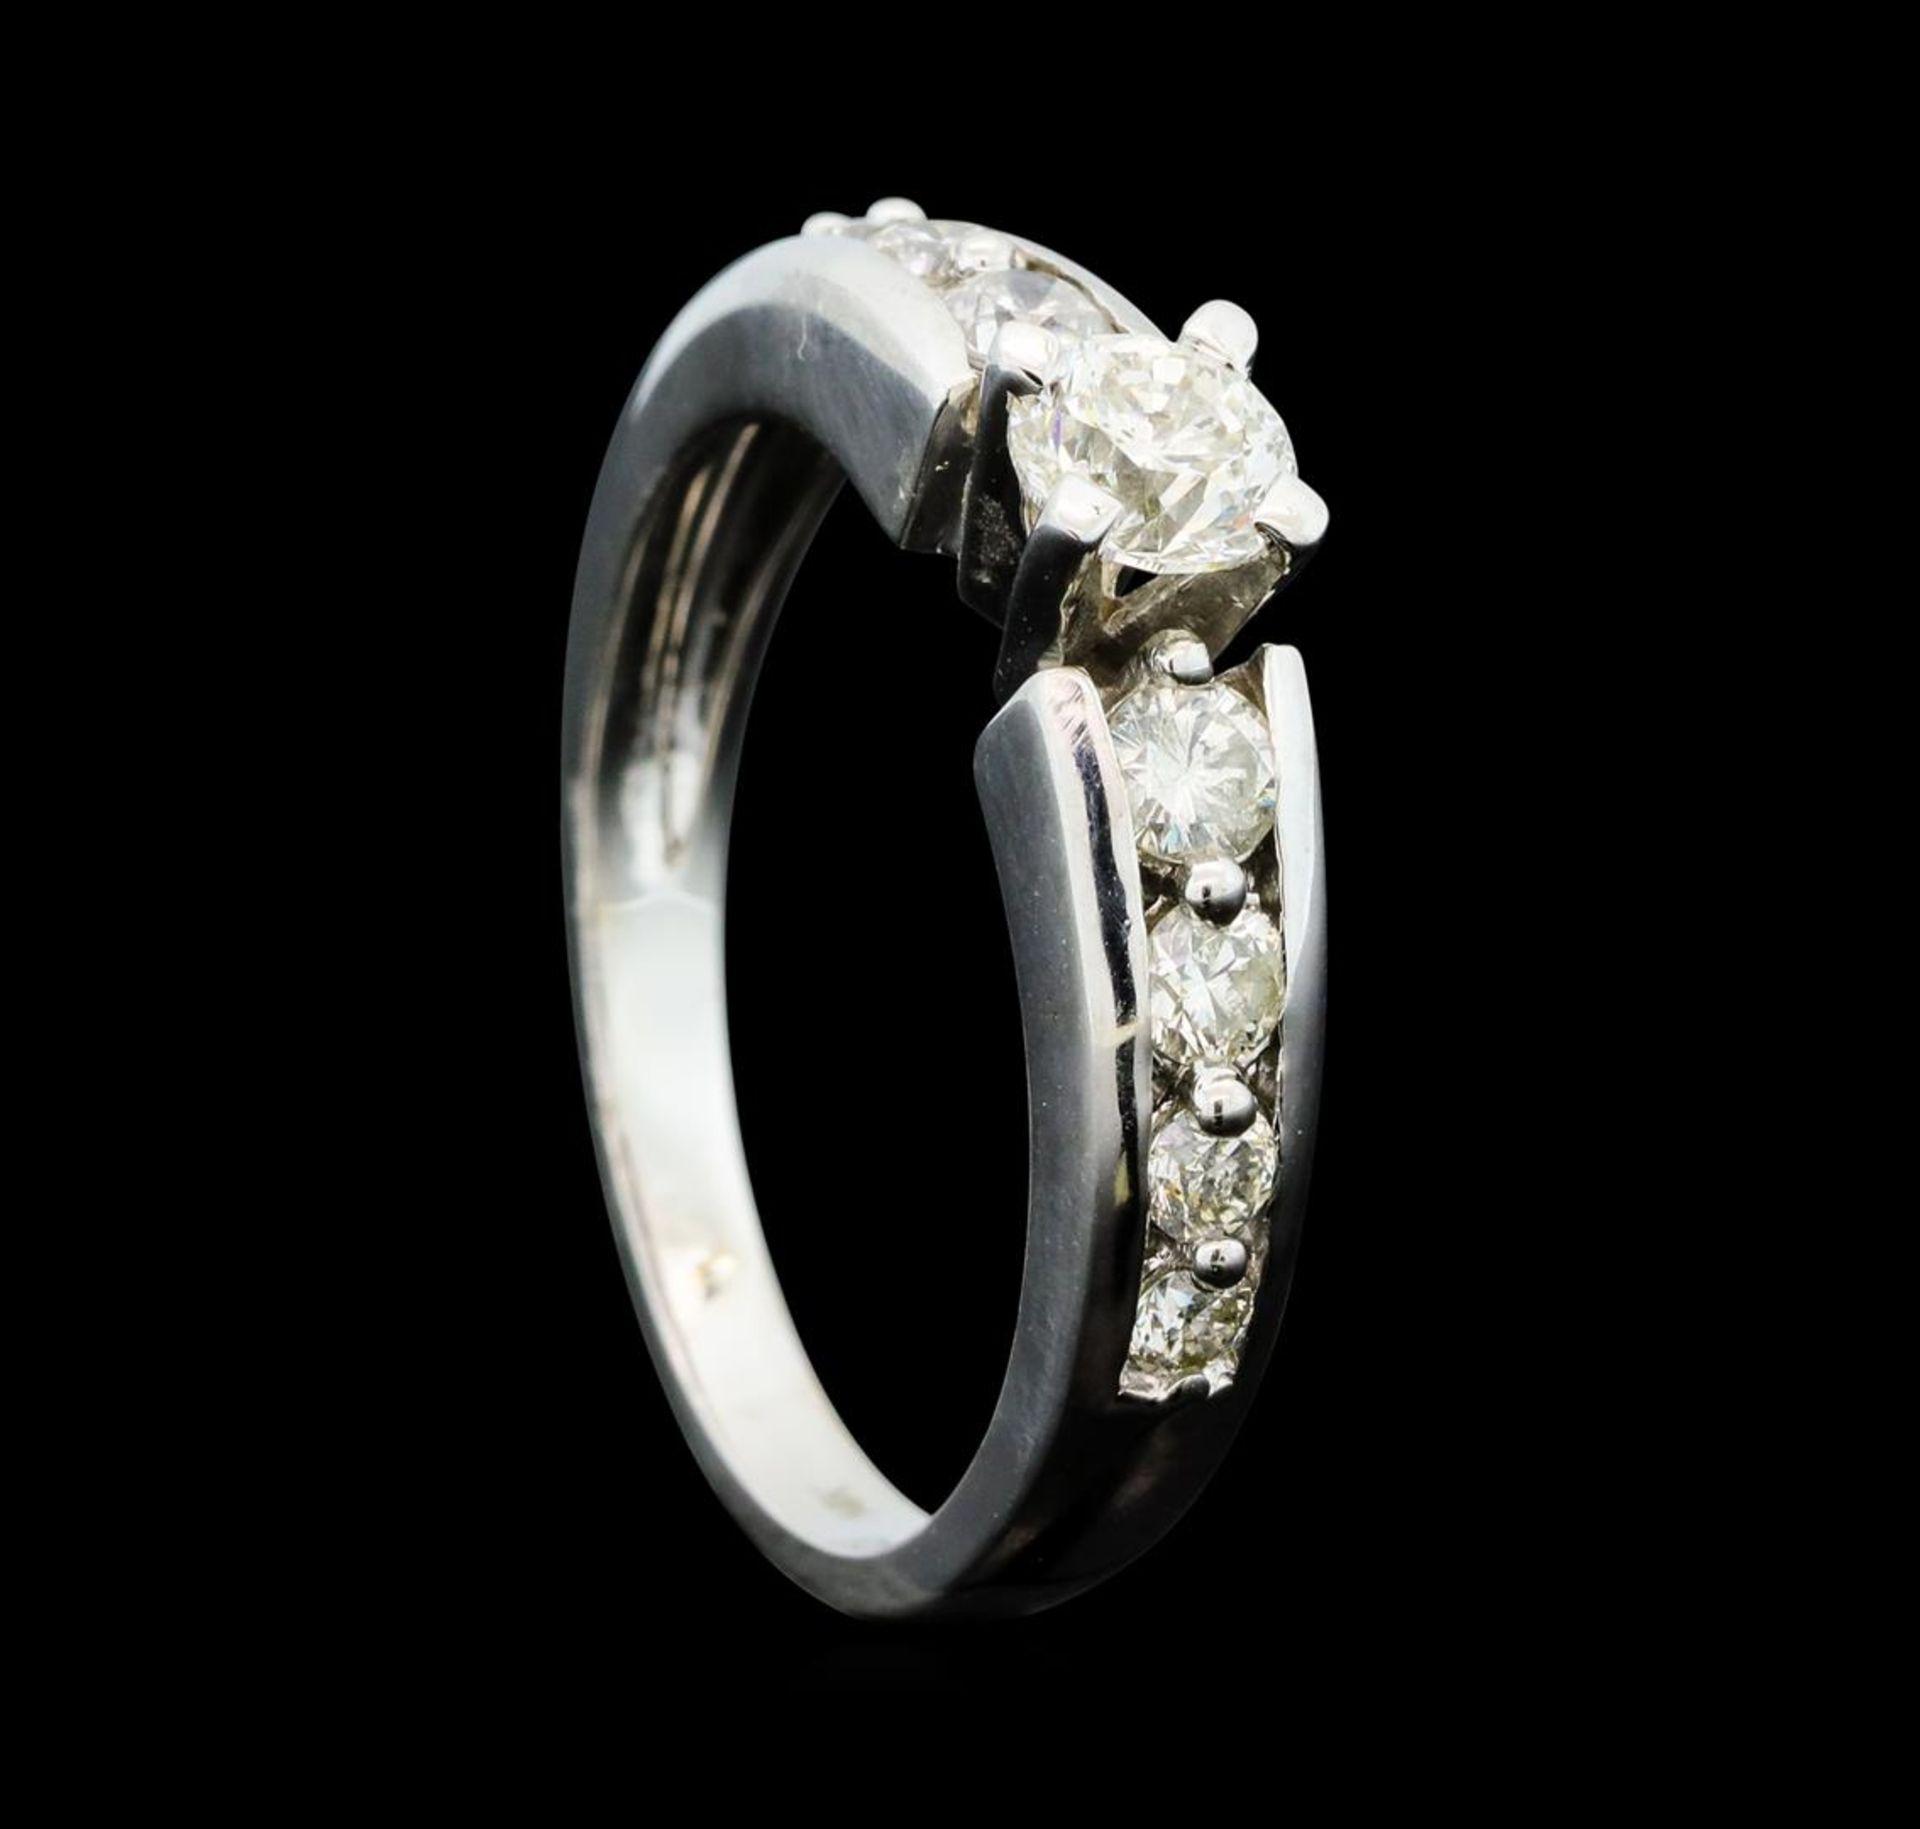 0.50 ctw Diamond Ring - 14KT White Gold - Image 4 of 4